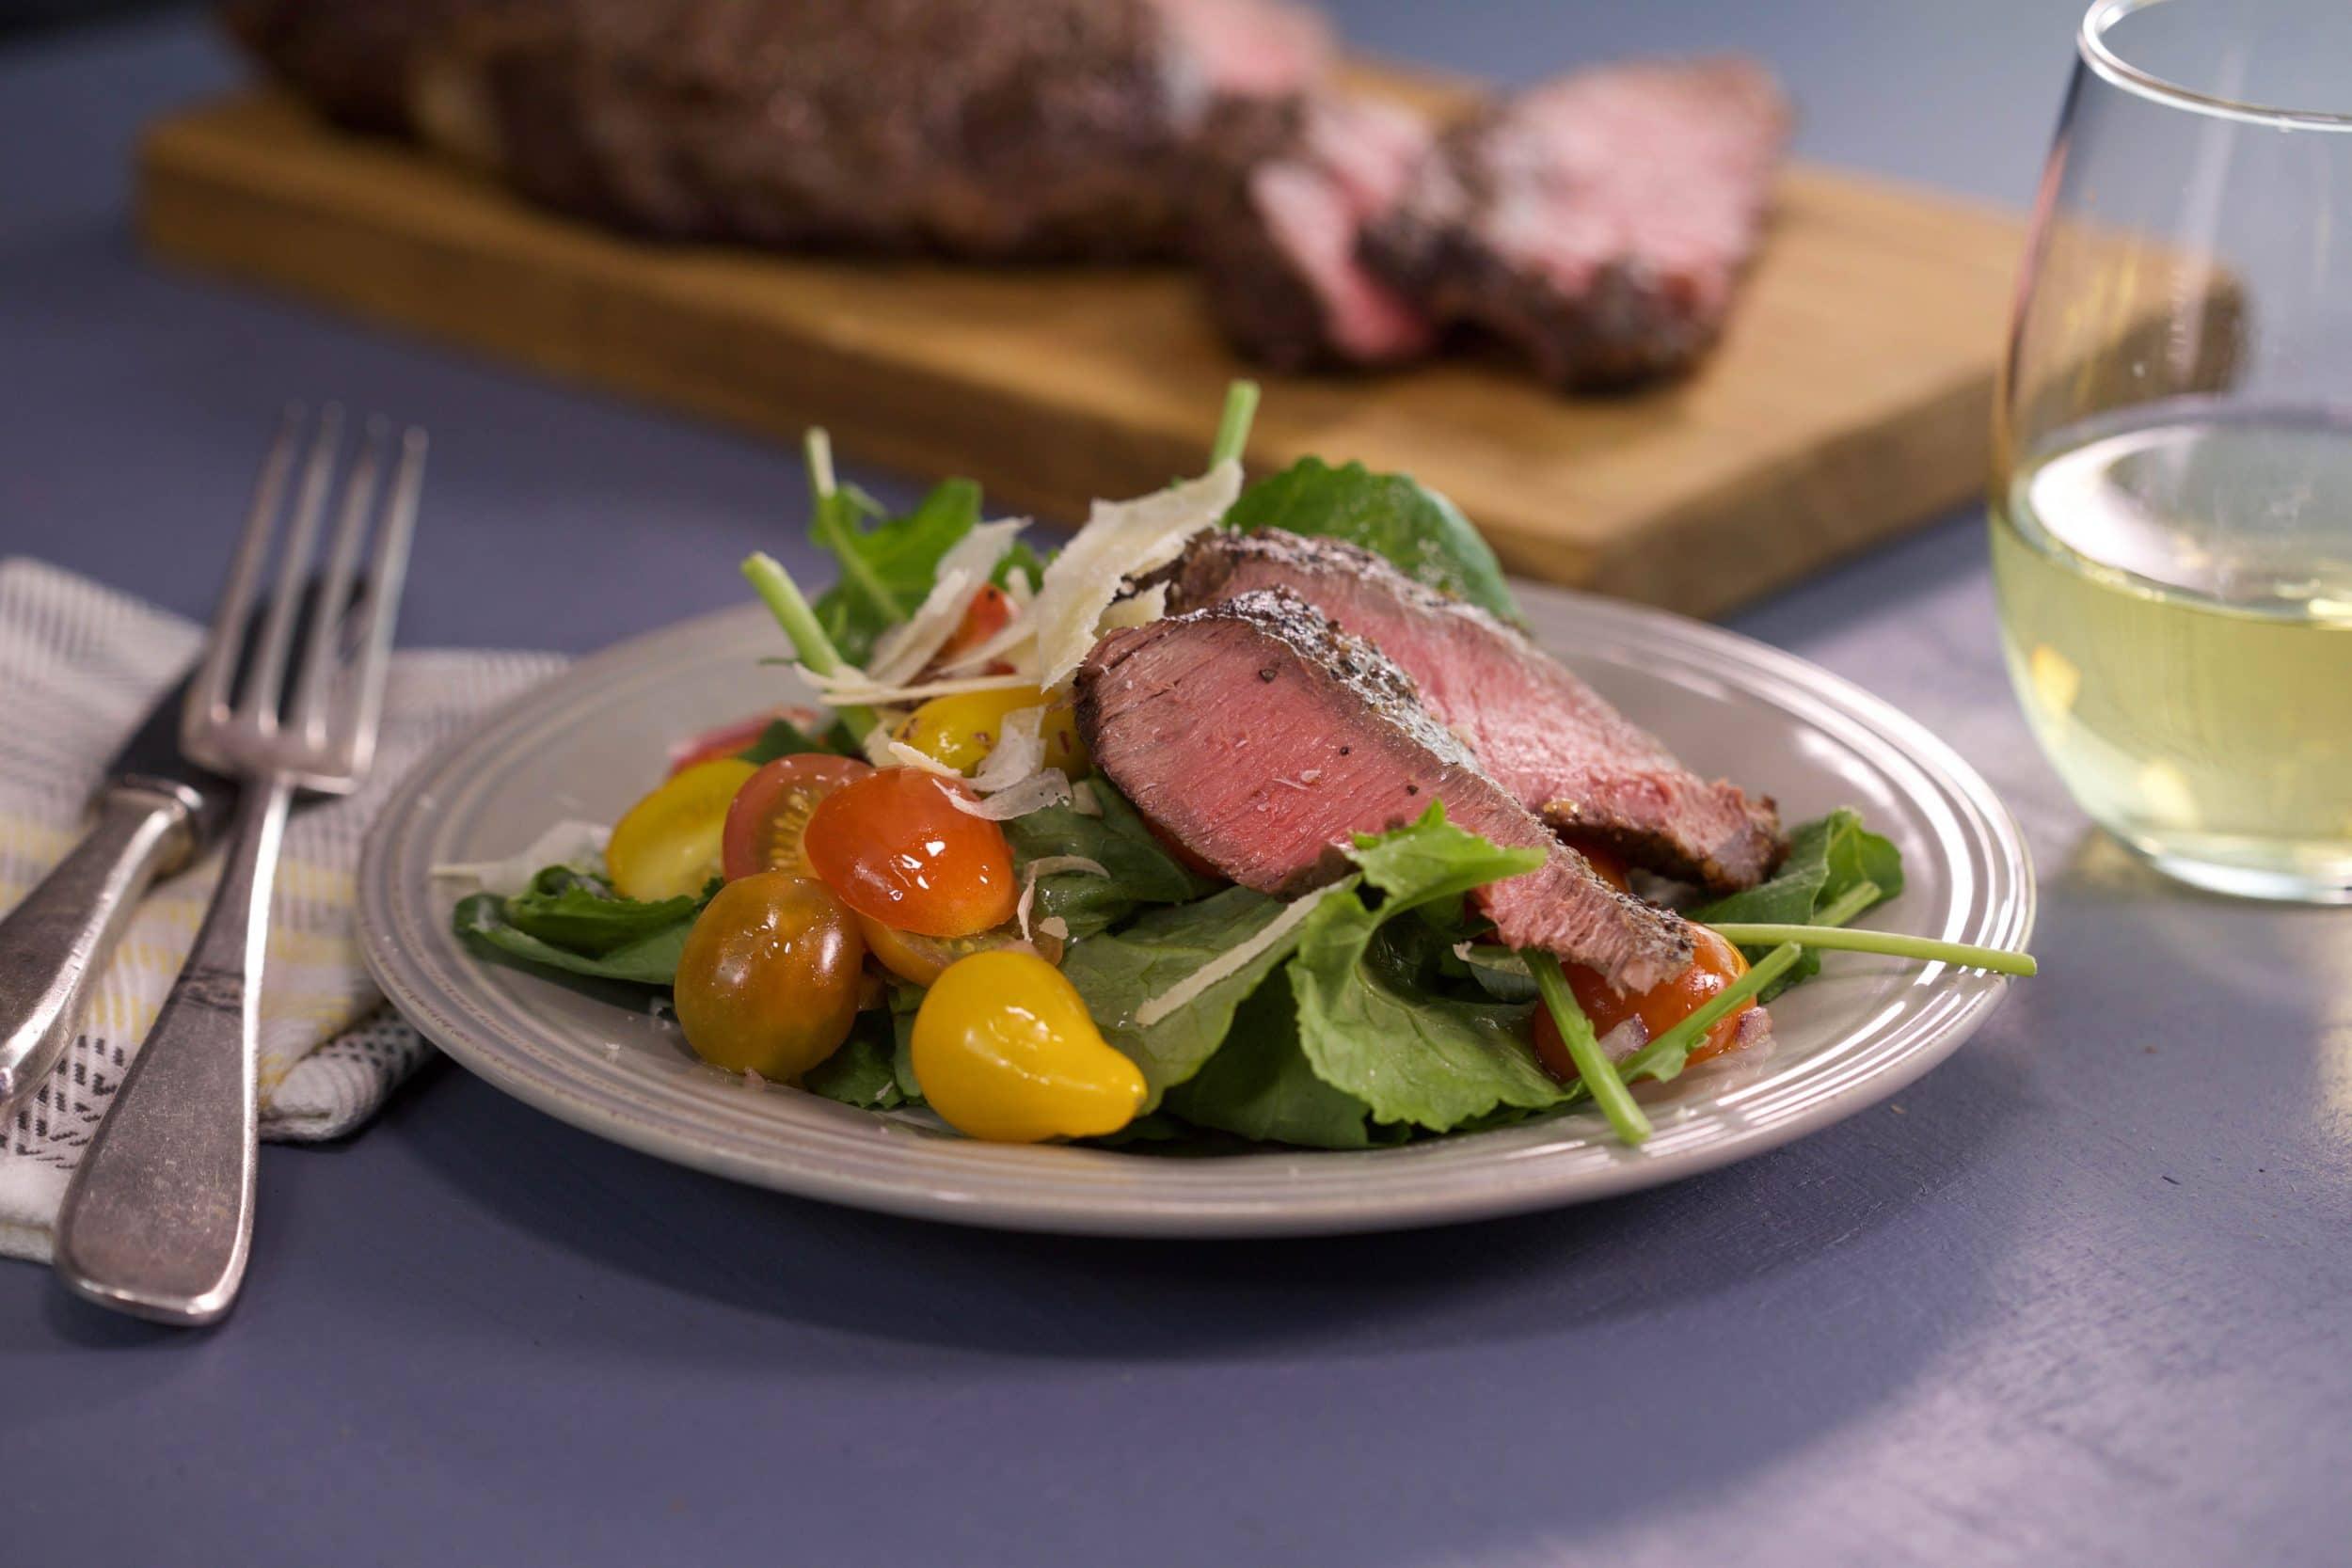 Steak and Baby Greens Salad